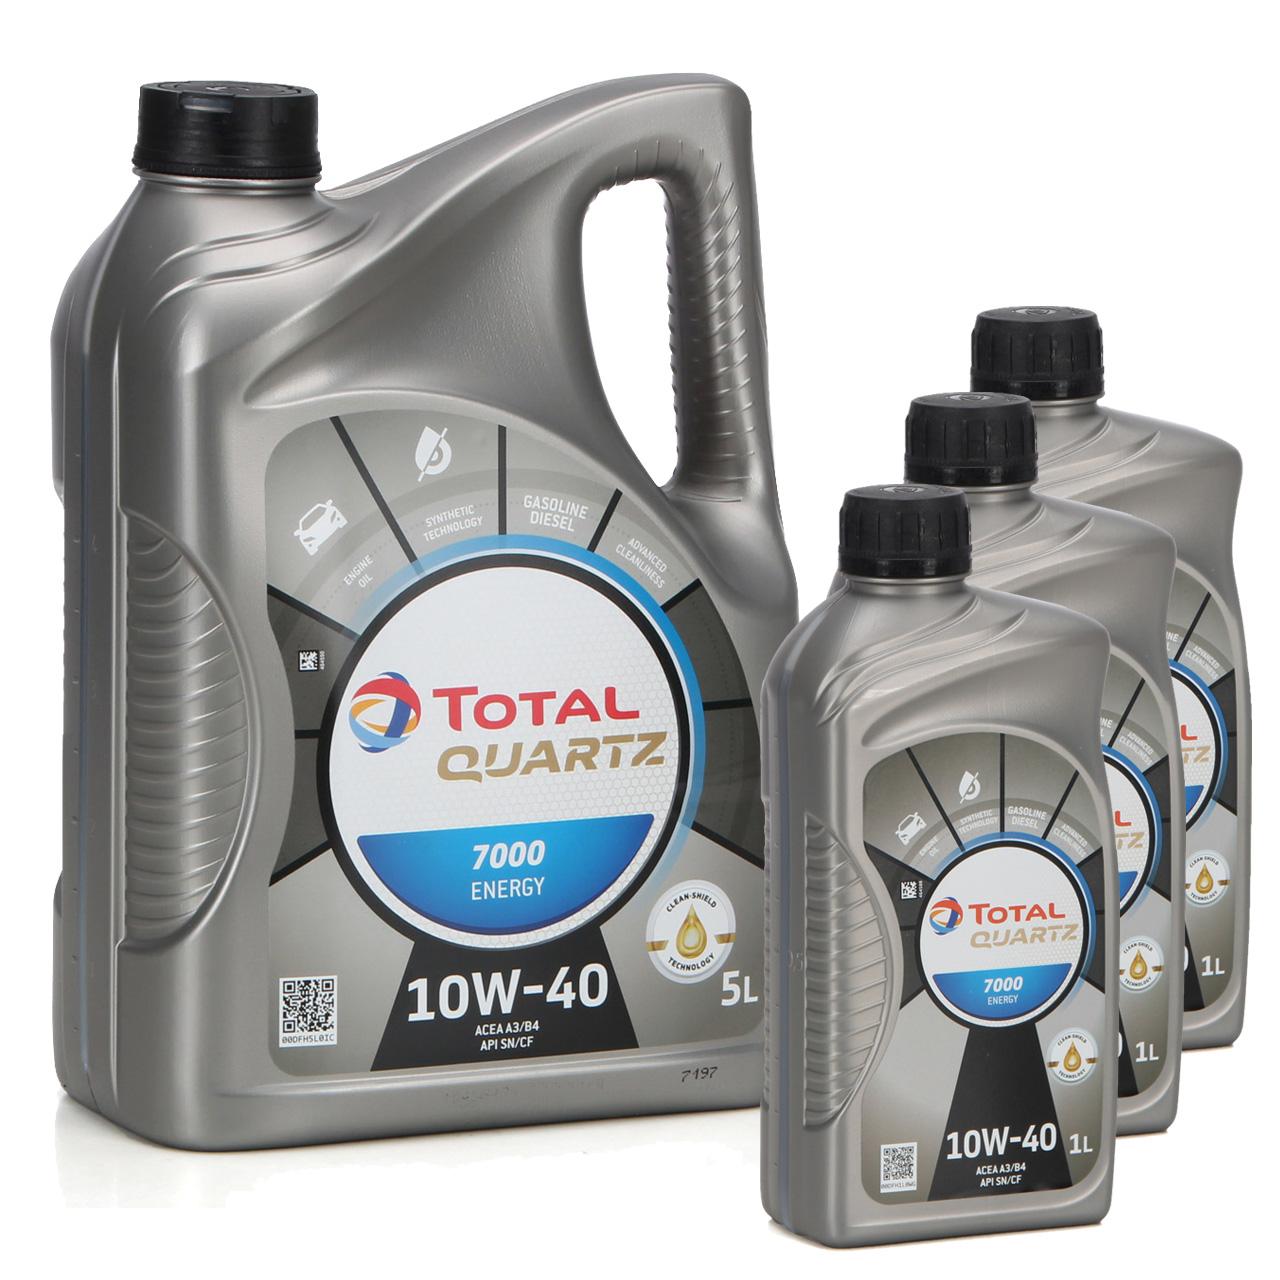 TOTAL QUARTZ 7000 ENERGY Motoröl Öl 10W-40 10W40 VW 501.01/505.00 - 8L 8 Liter